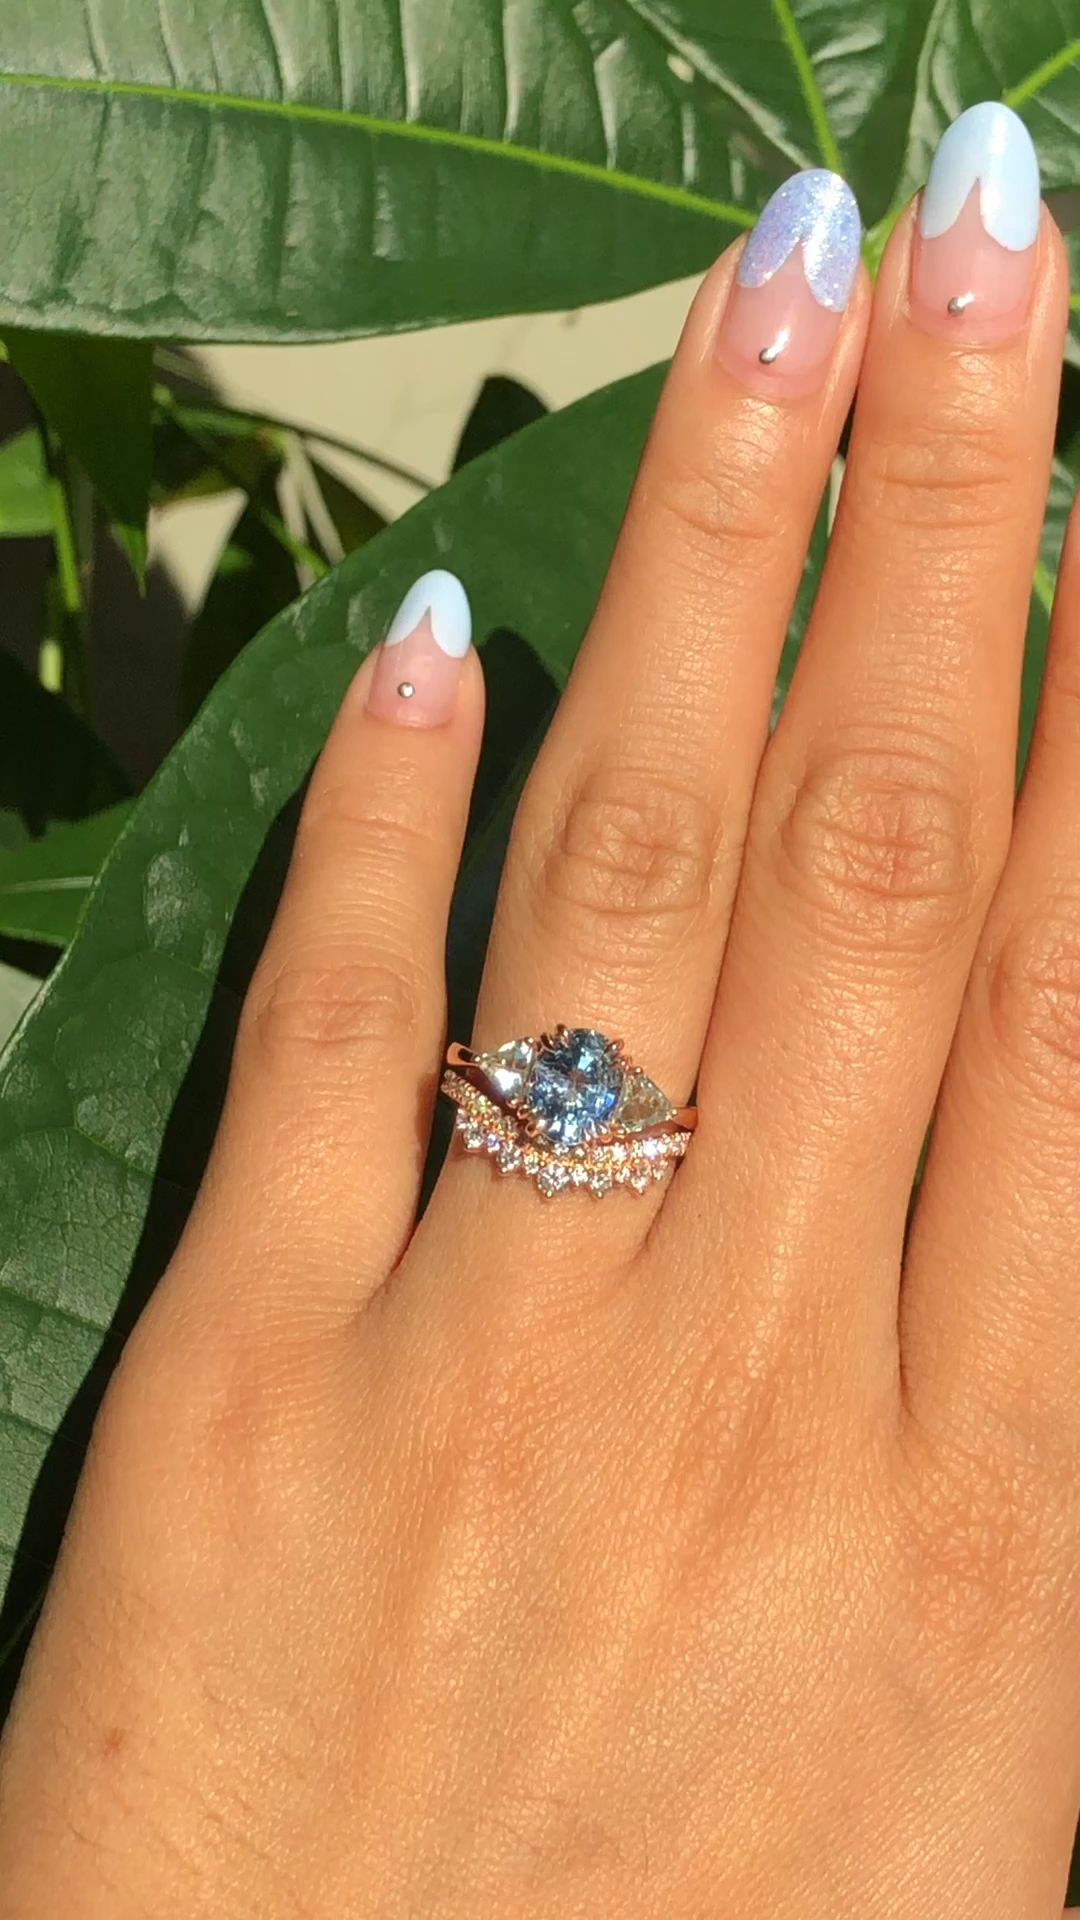 OOAK 3 Stone Bridal Ring Set by La More Design